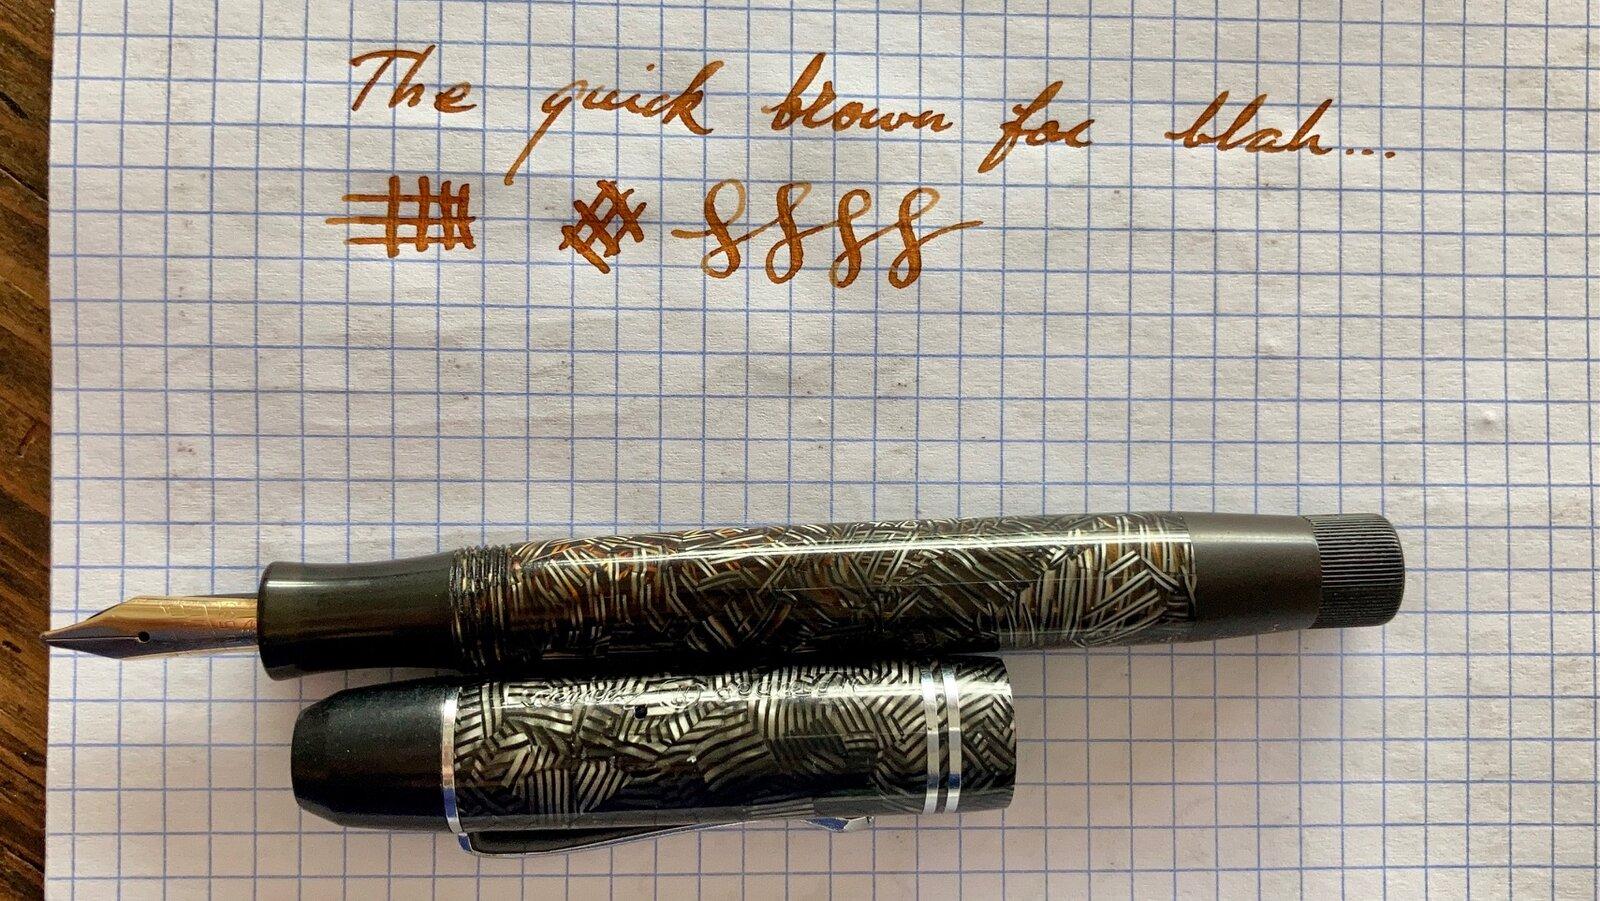 matador writing sample.jpg